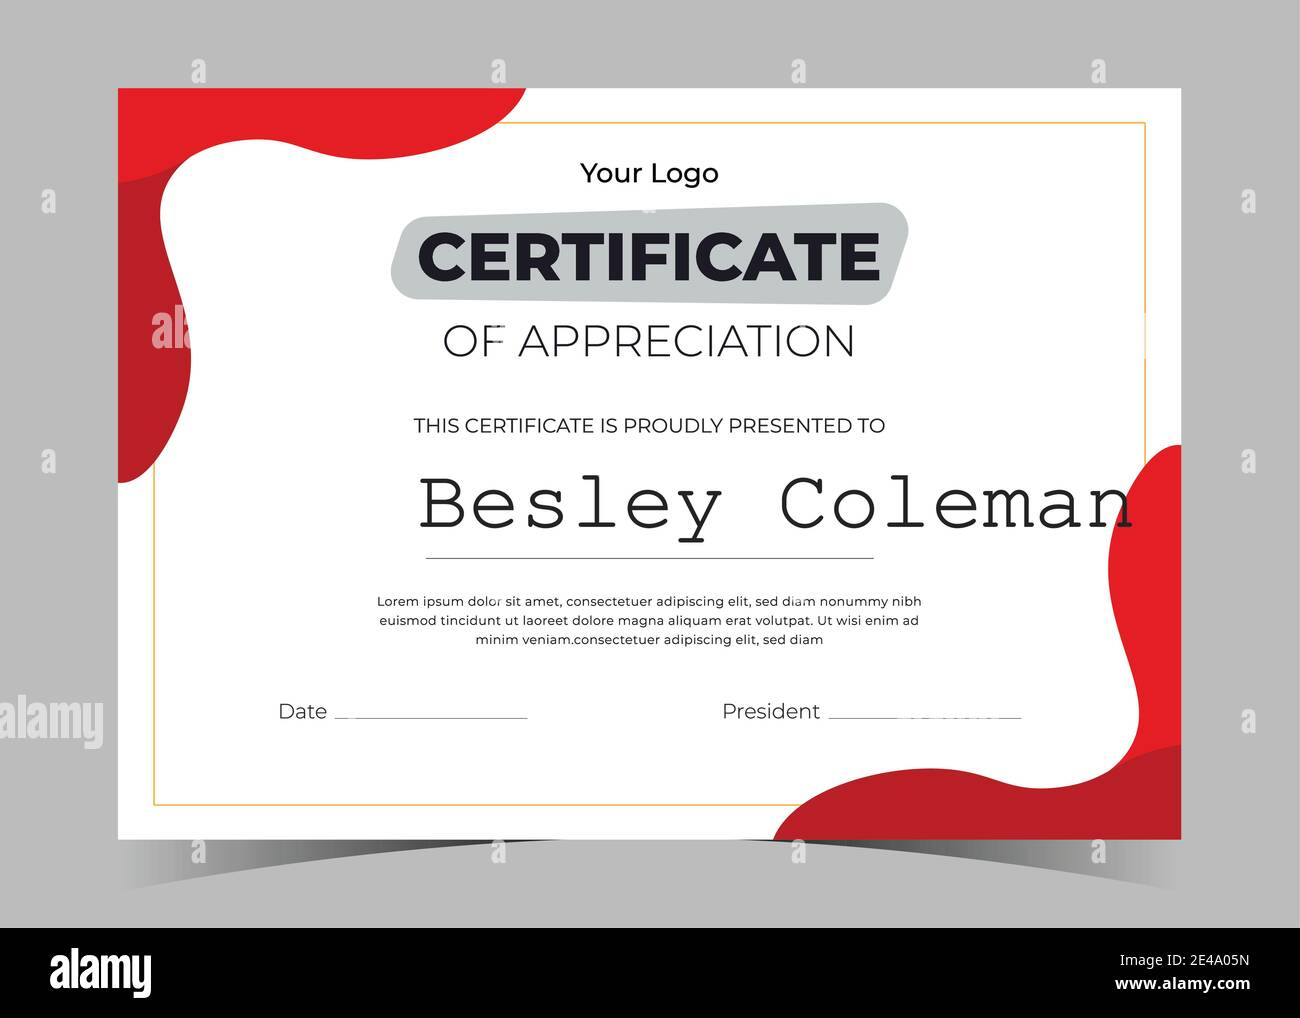 award certificate template. diploma certificate template Regarding Professional Award Certificate Template